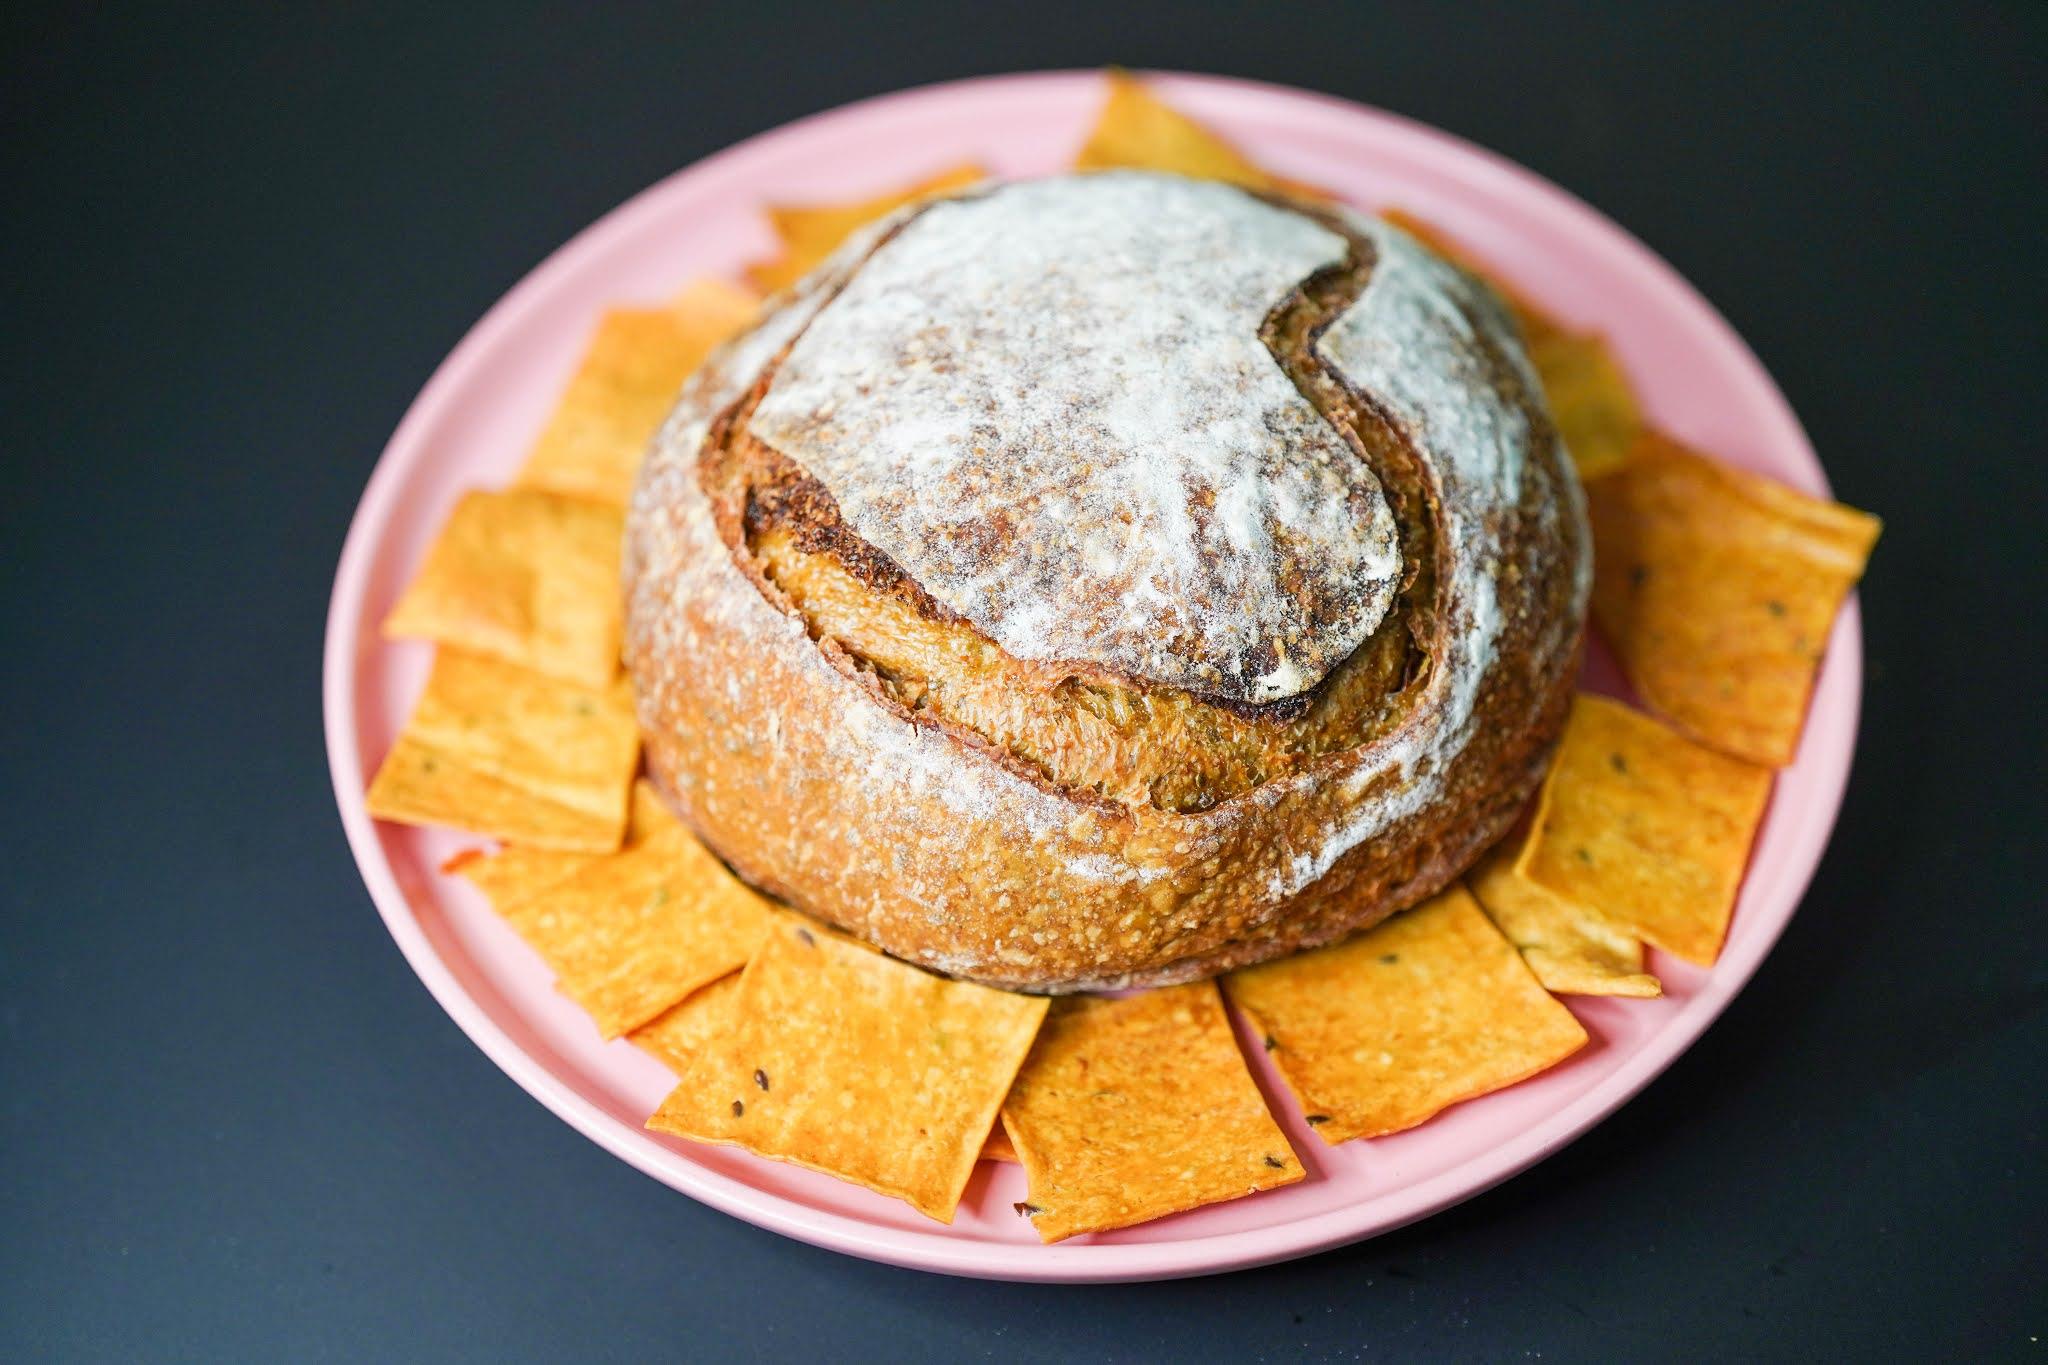 gugubakes: cny huat beet sourdough bread